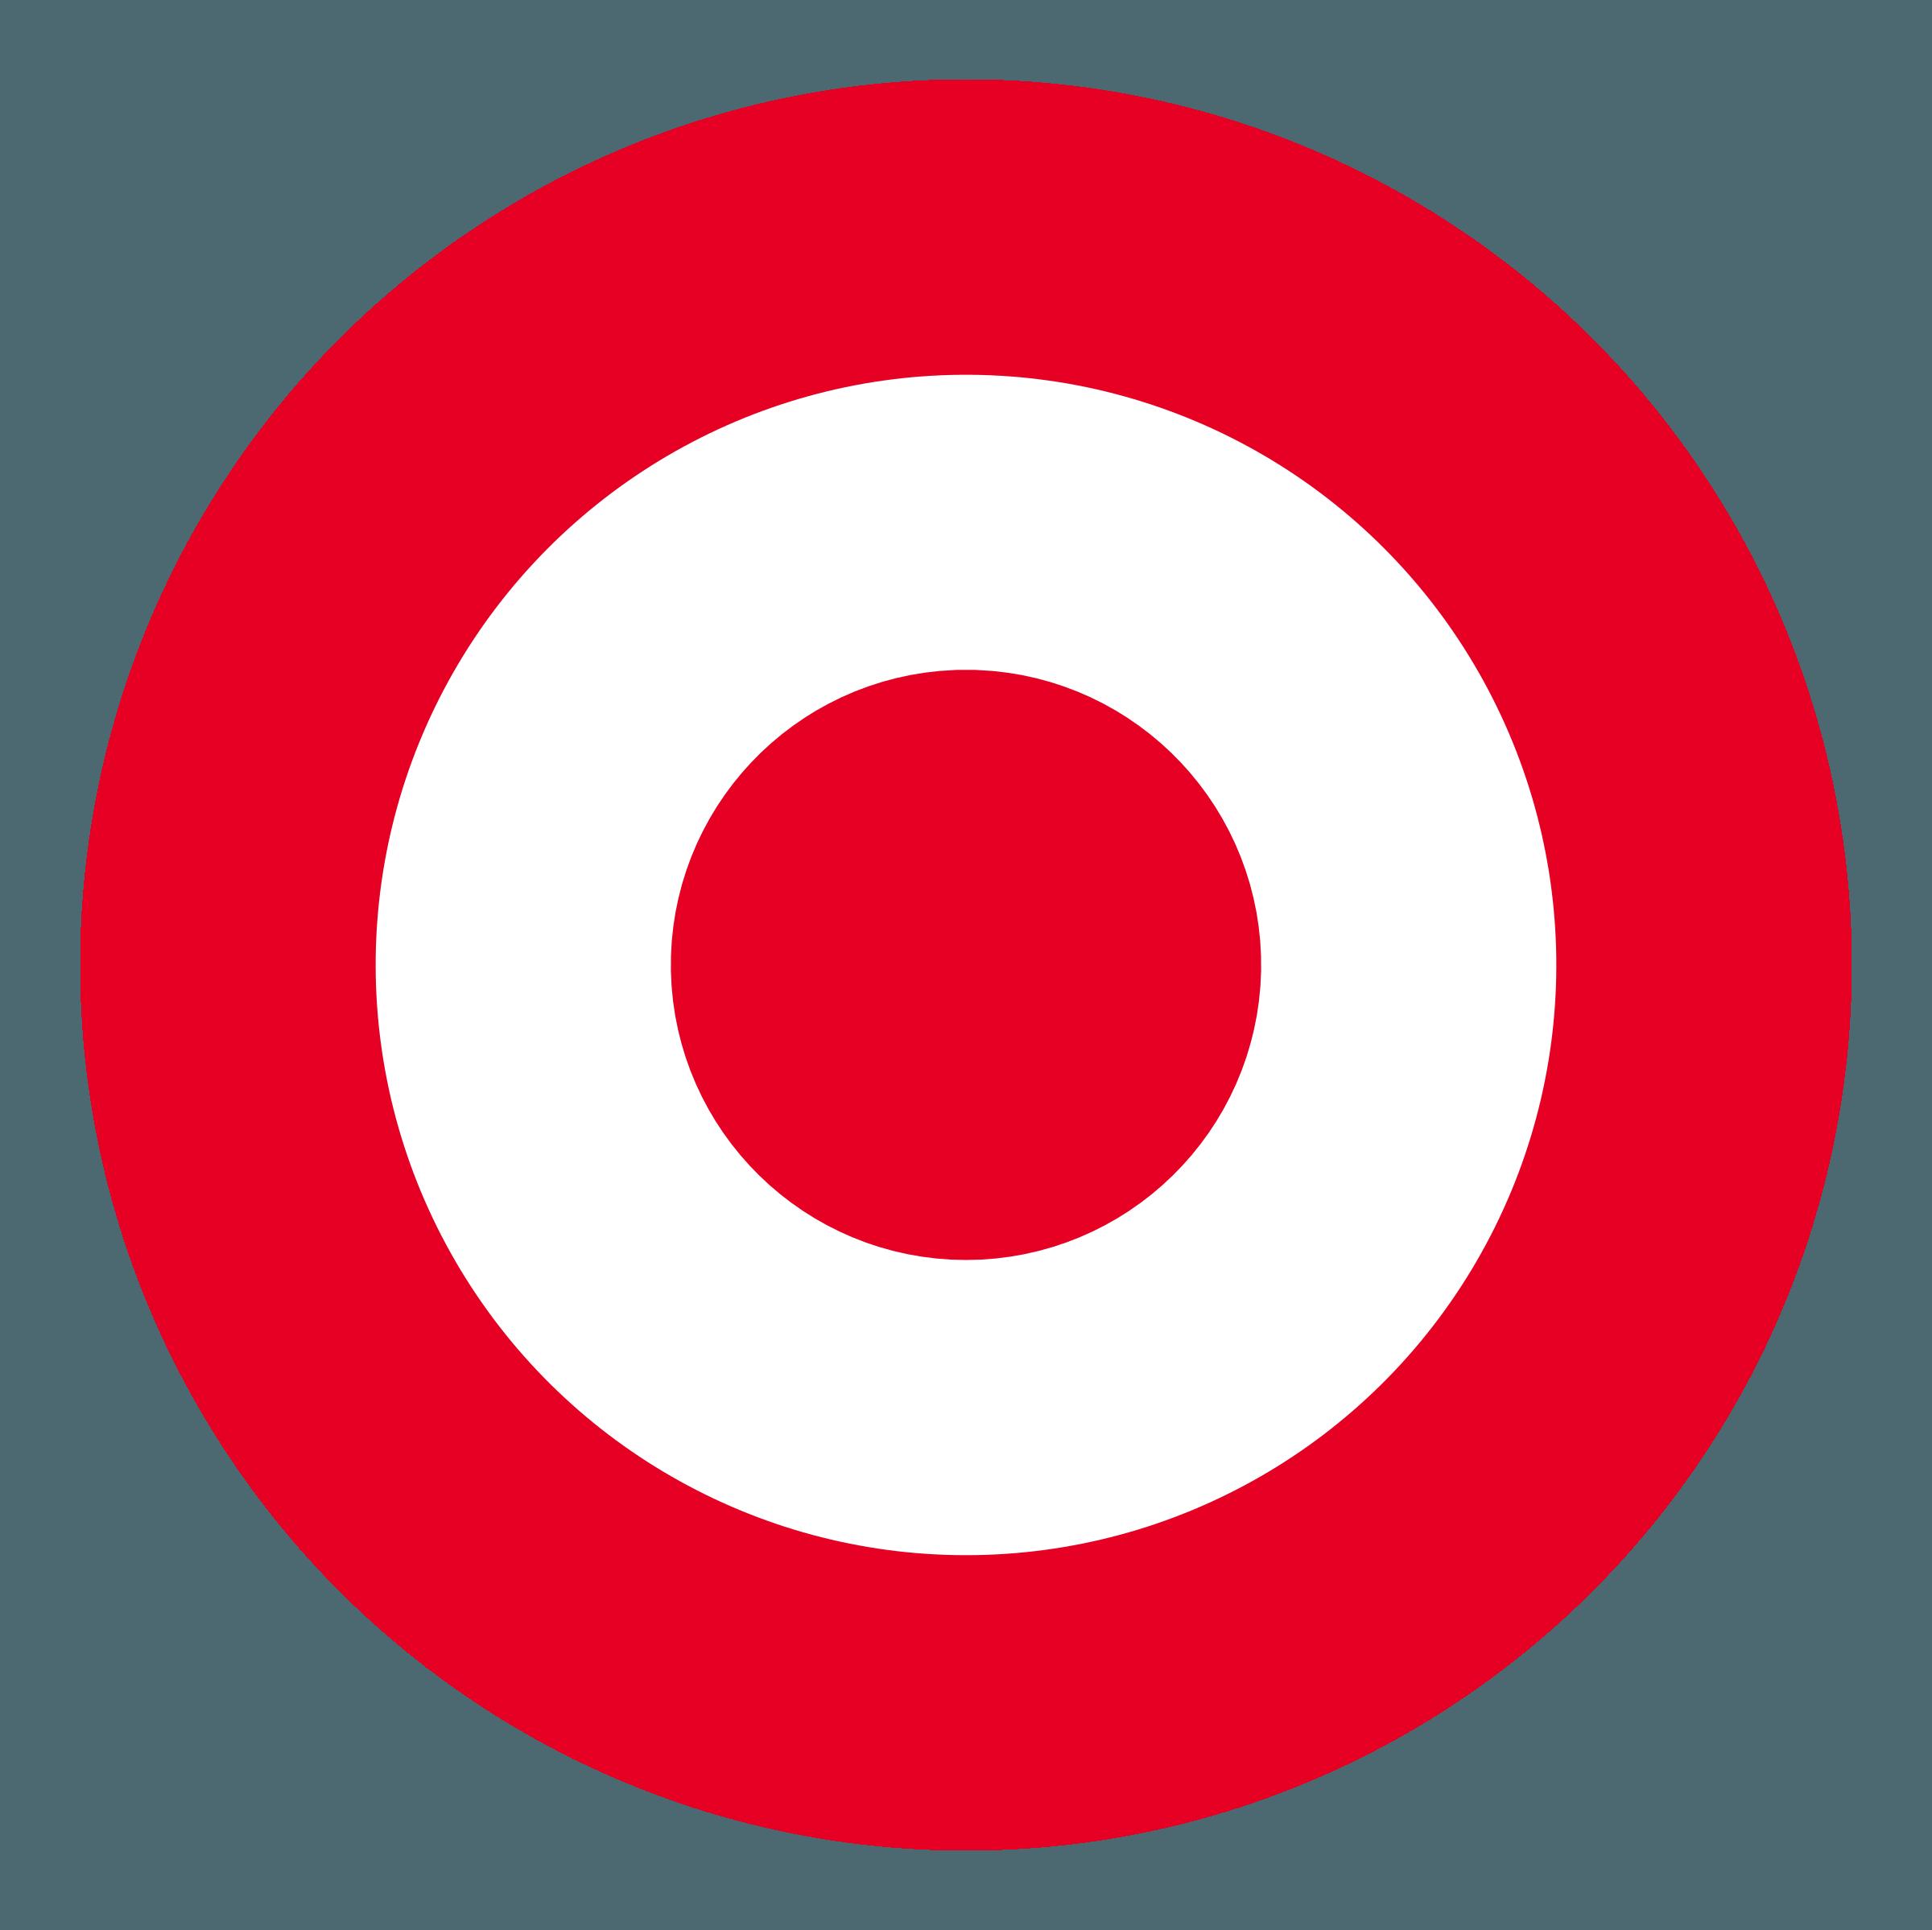 Crossroads Towne Center Target Logo Logos, Vodafone